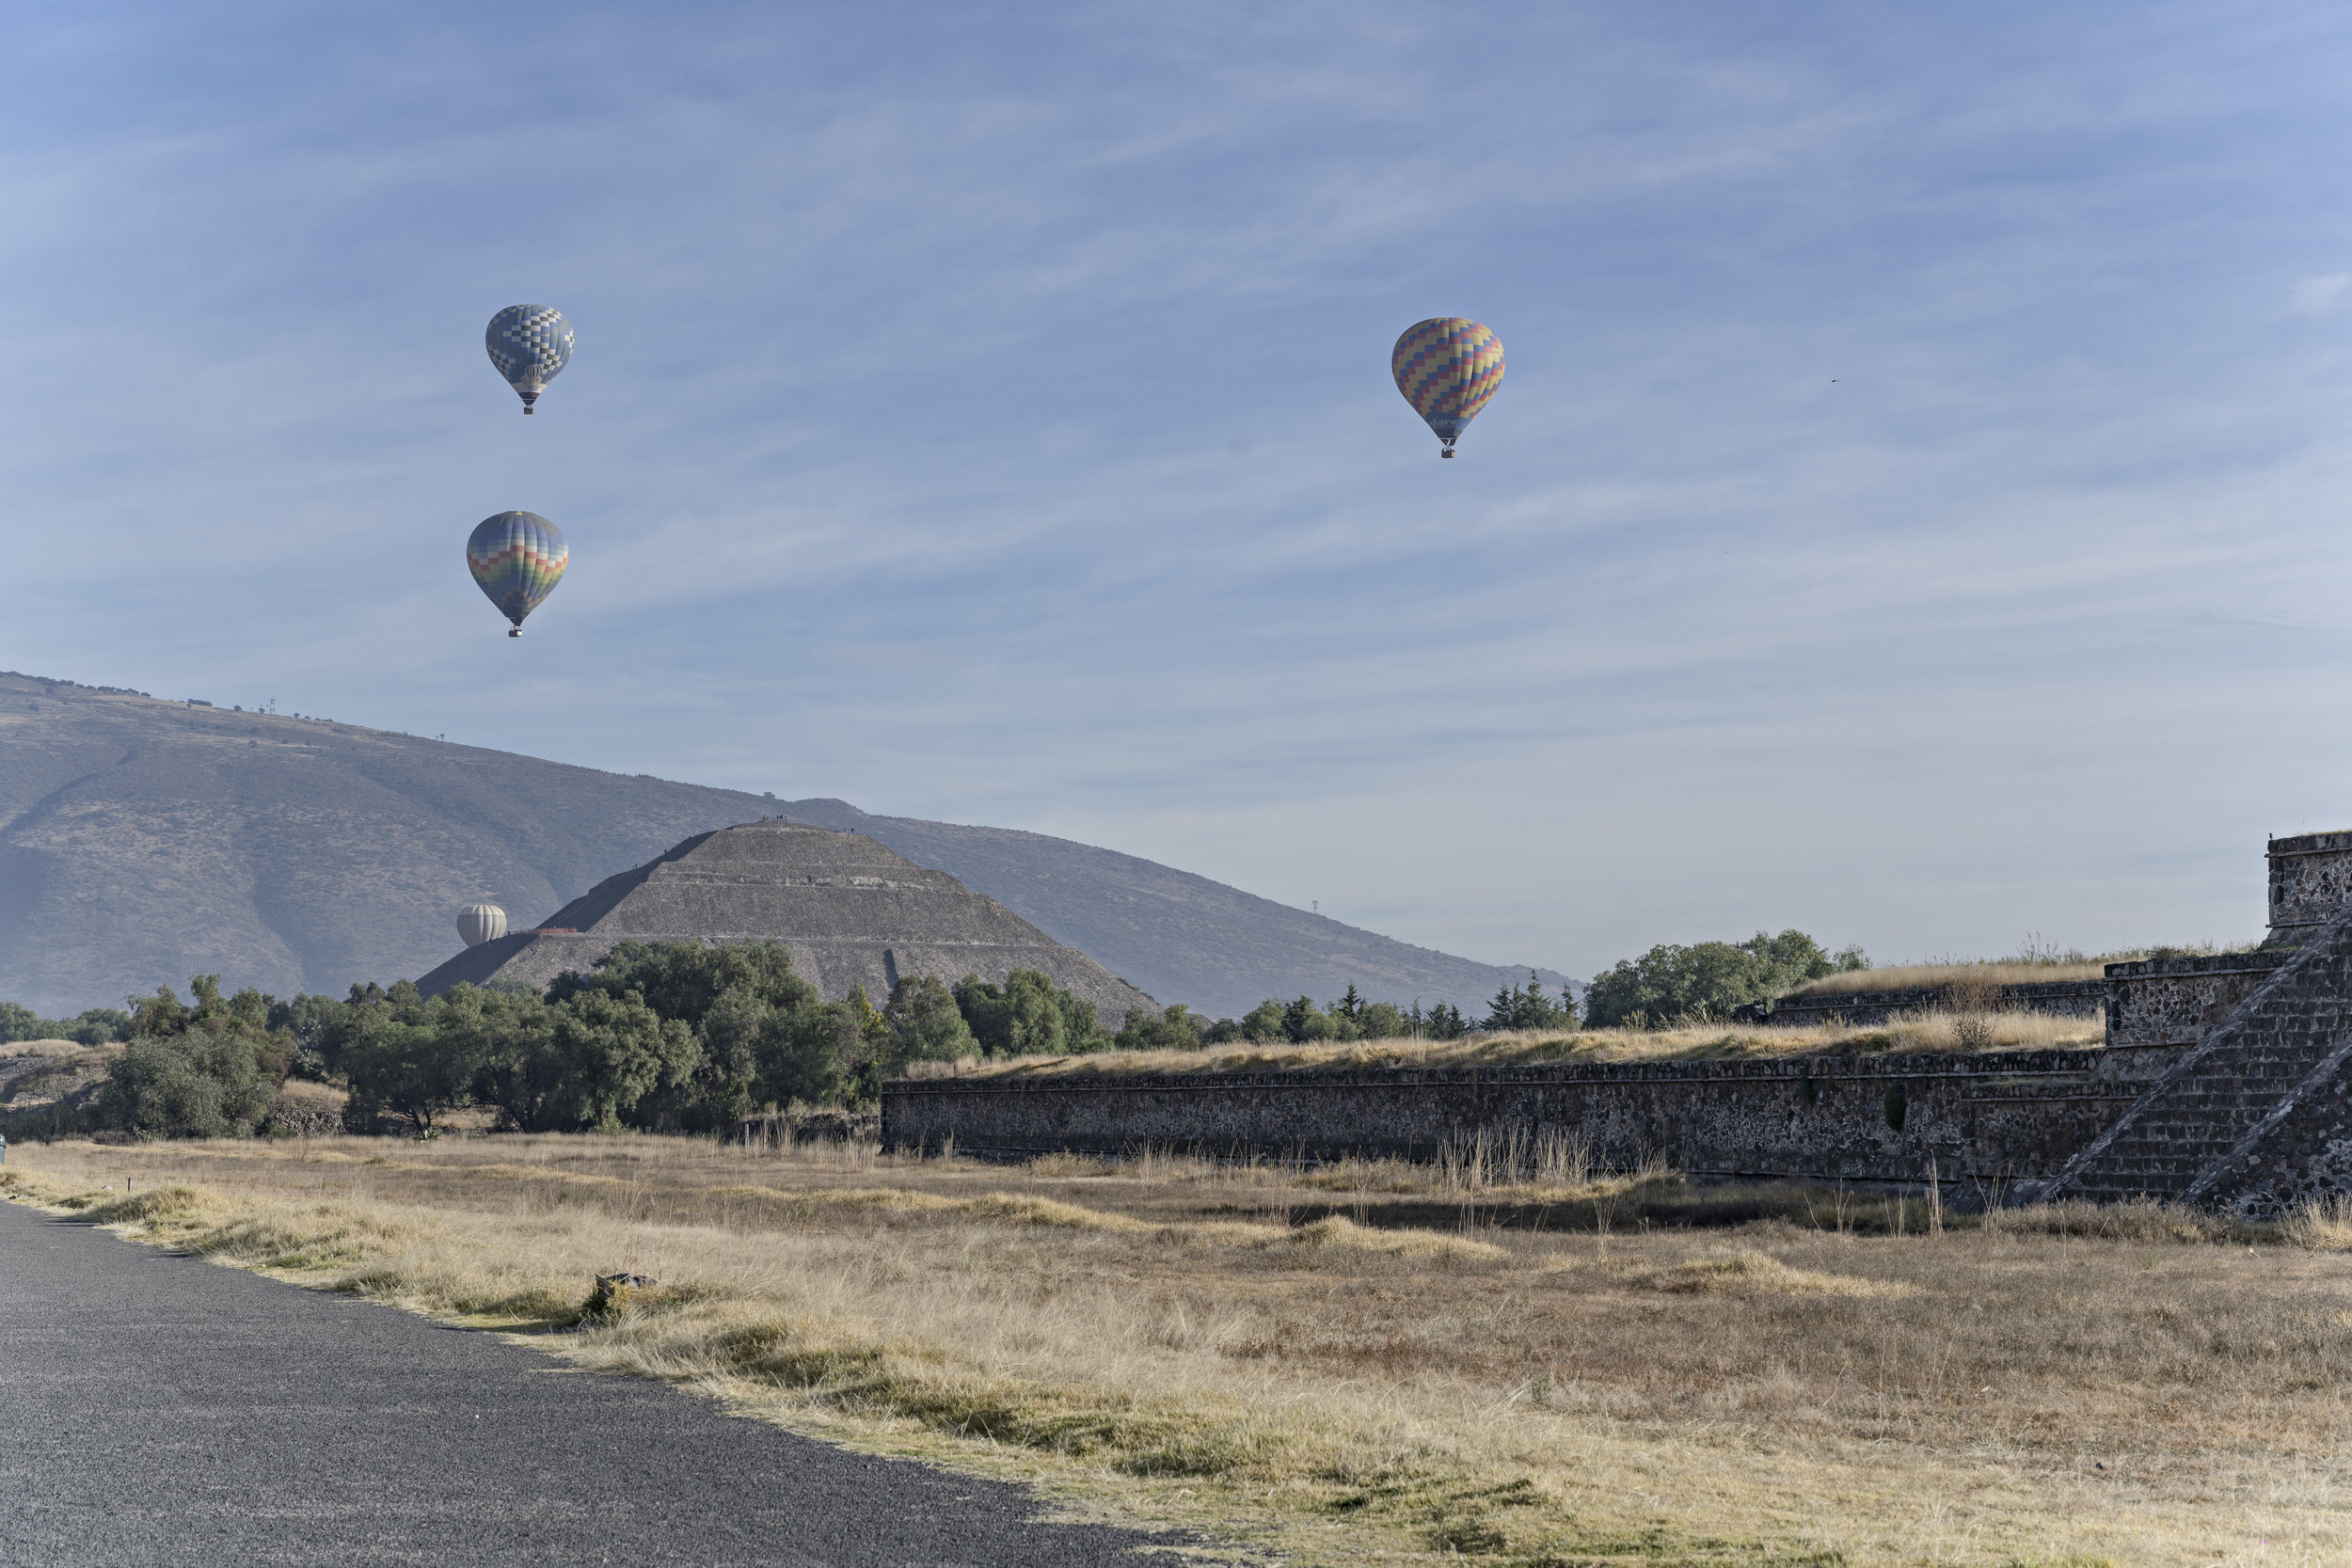 Air Balloons atcPyramid SiteBlog.jpg